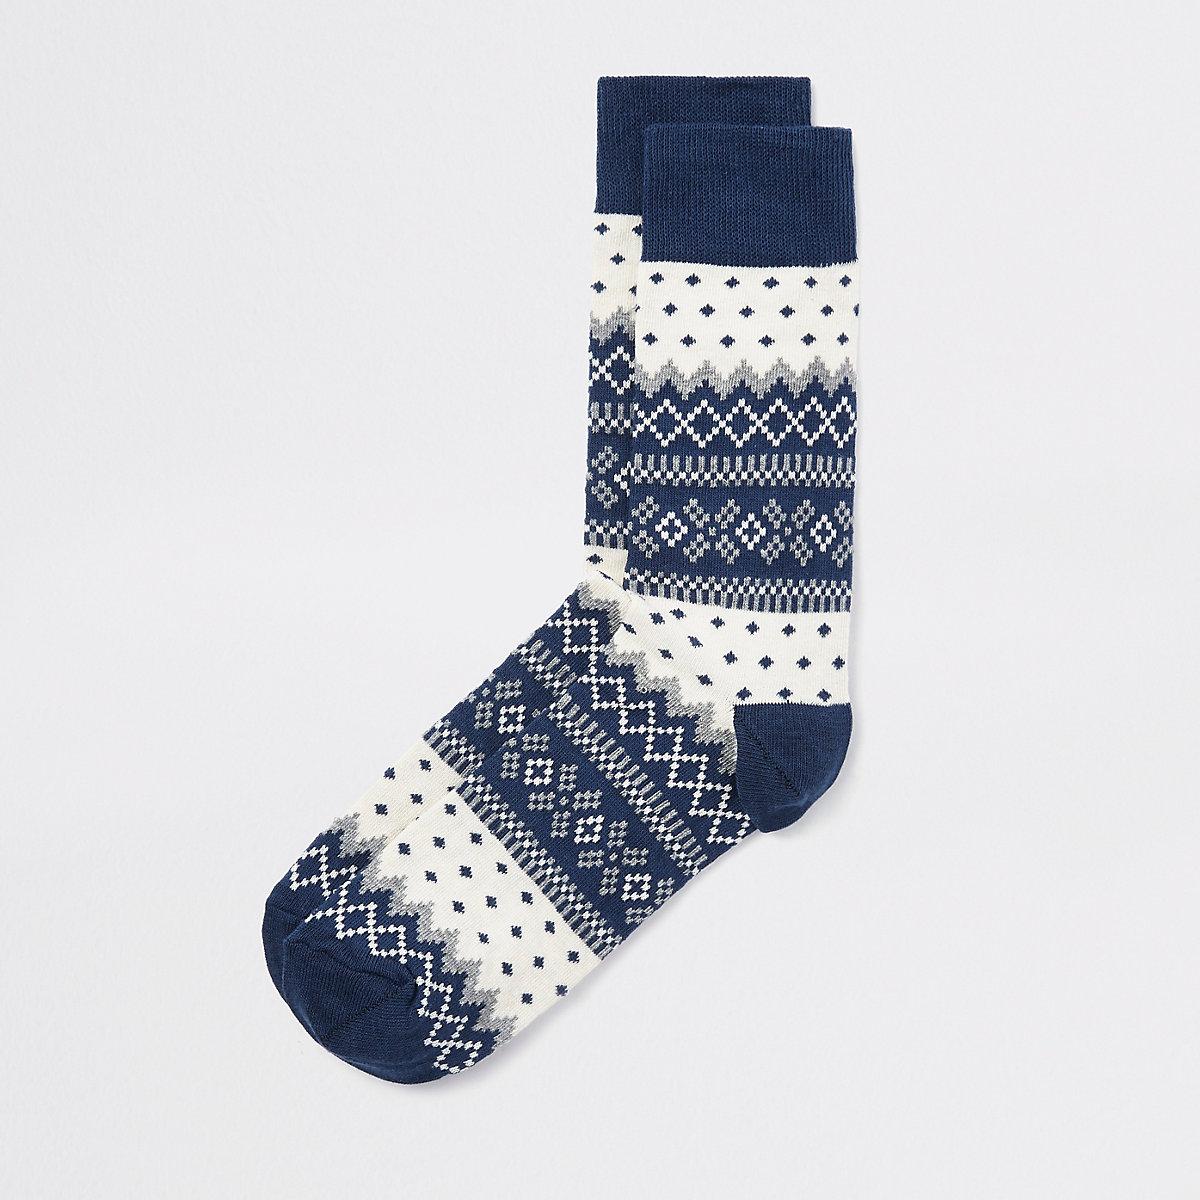 Blue Christmas socks